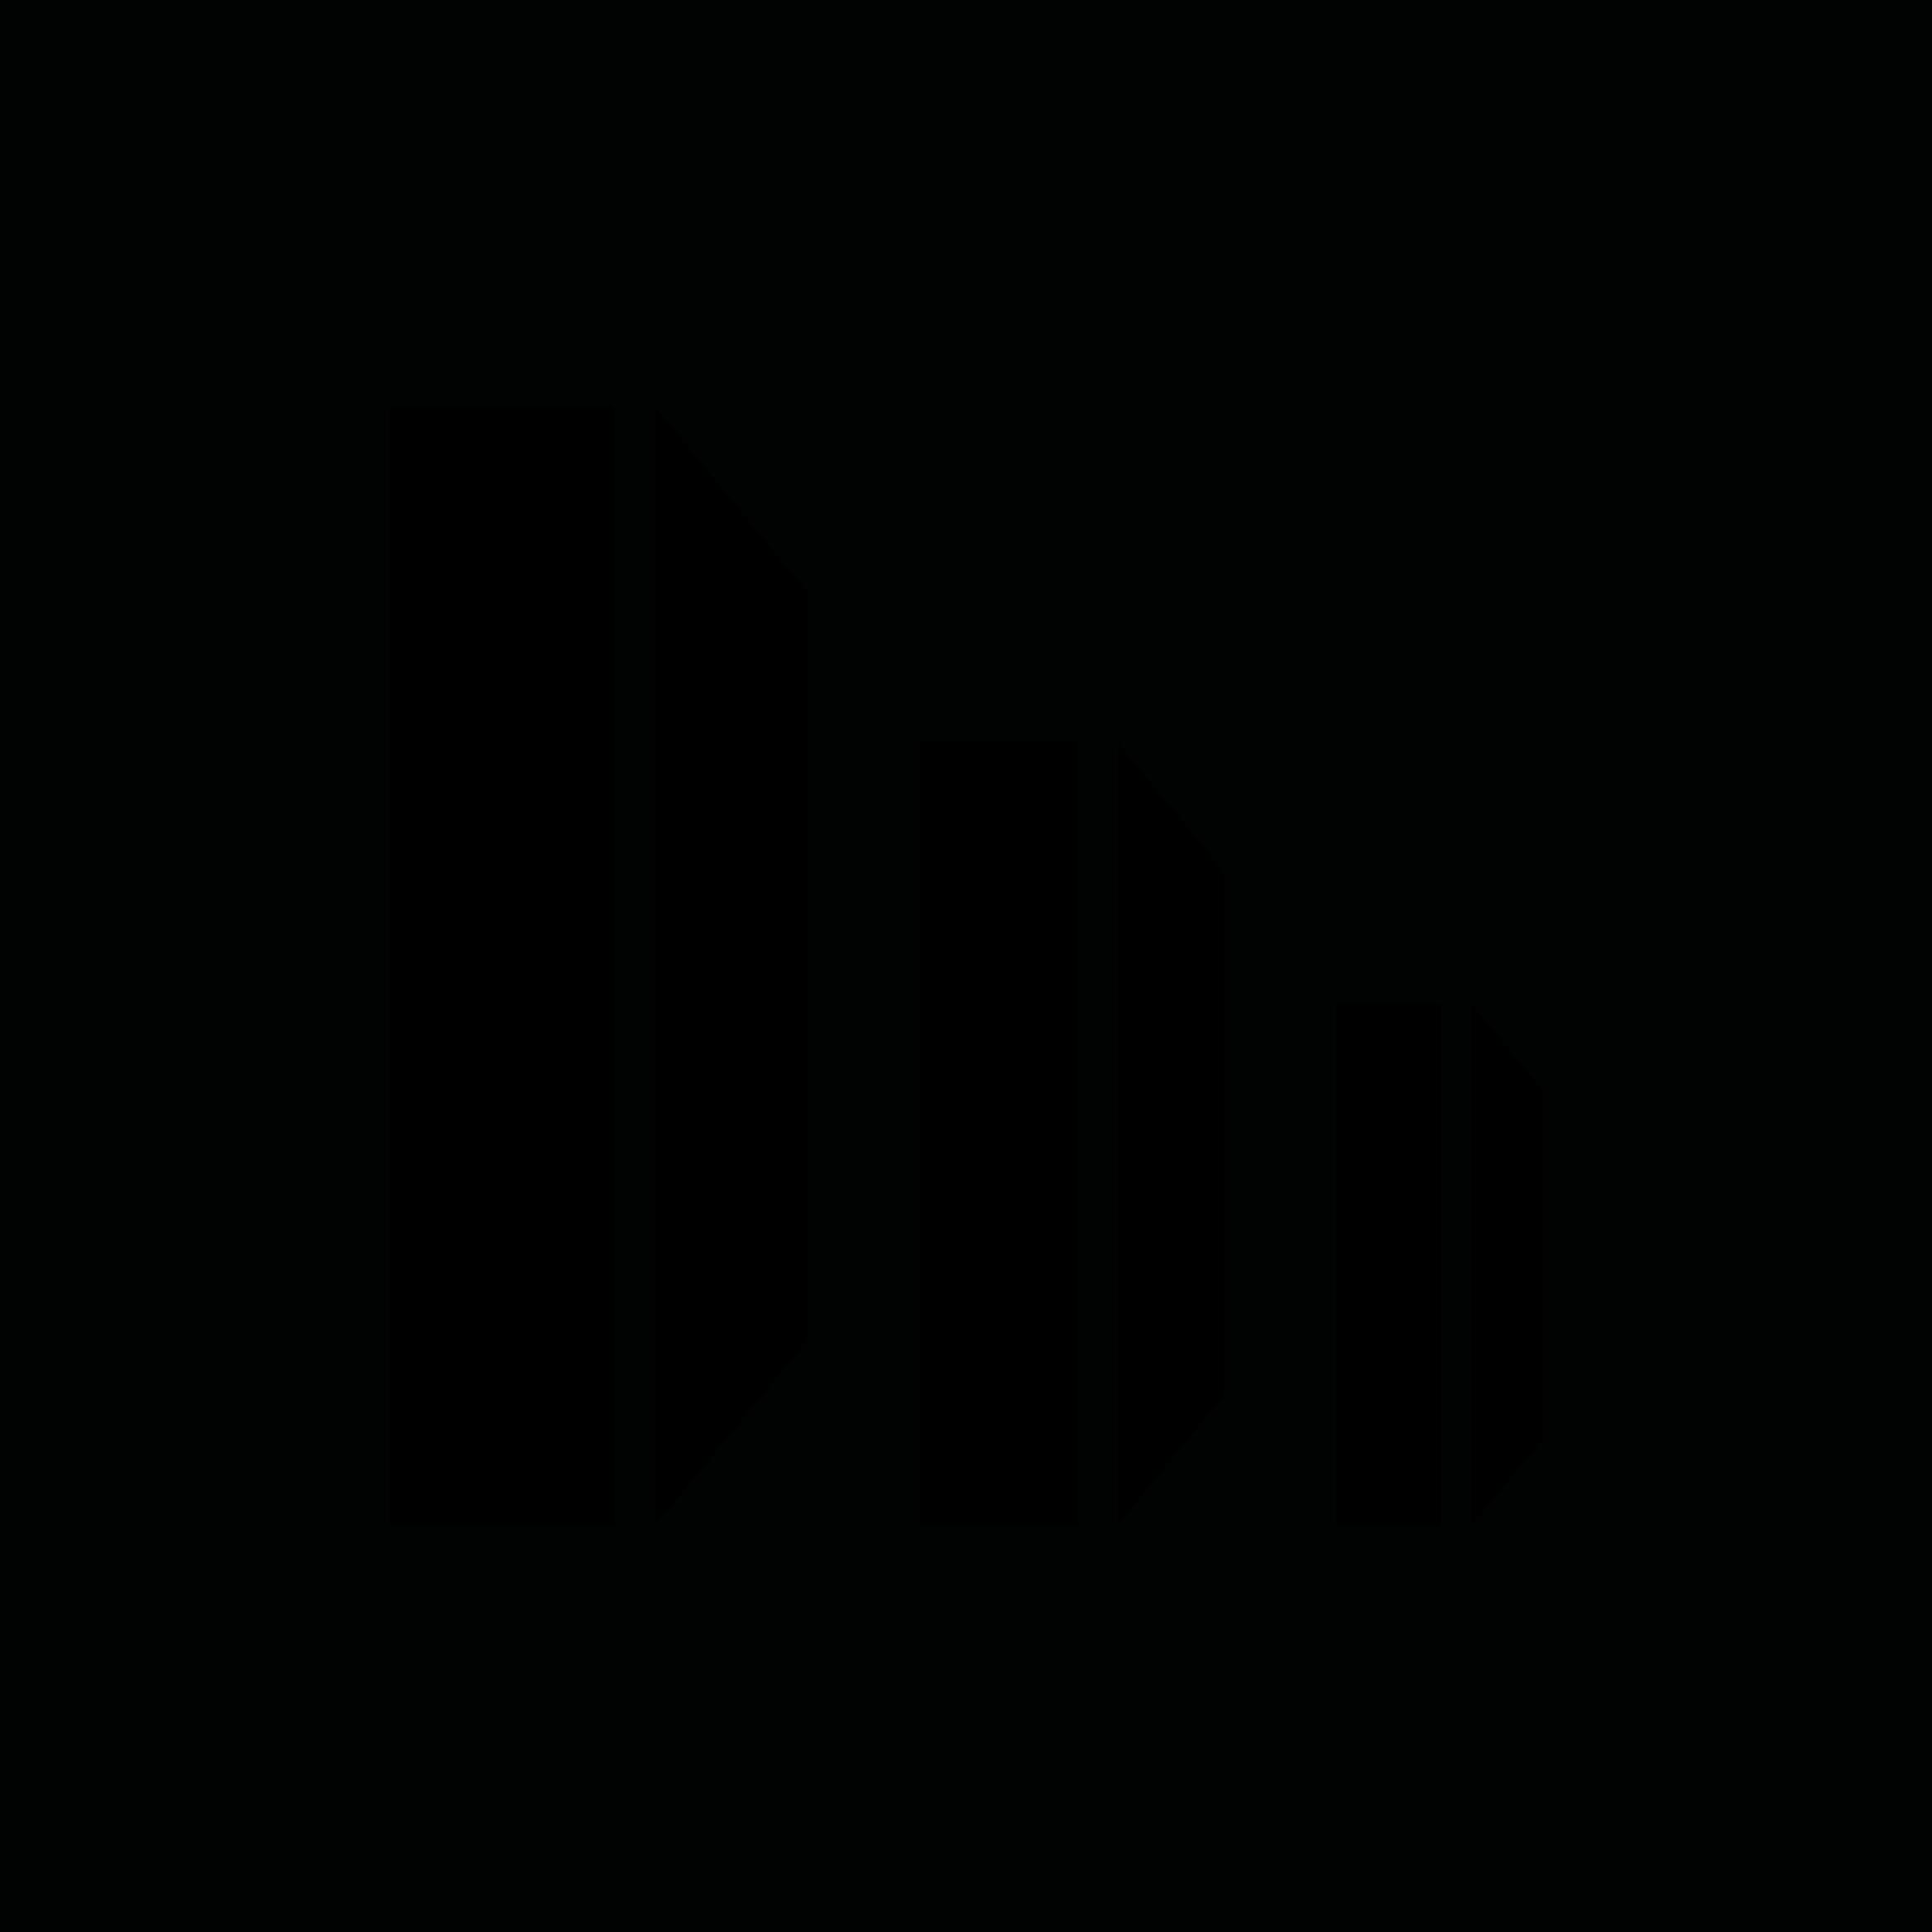 logo_simple_noir